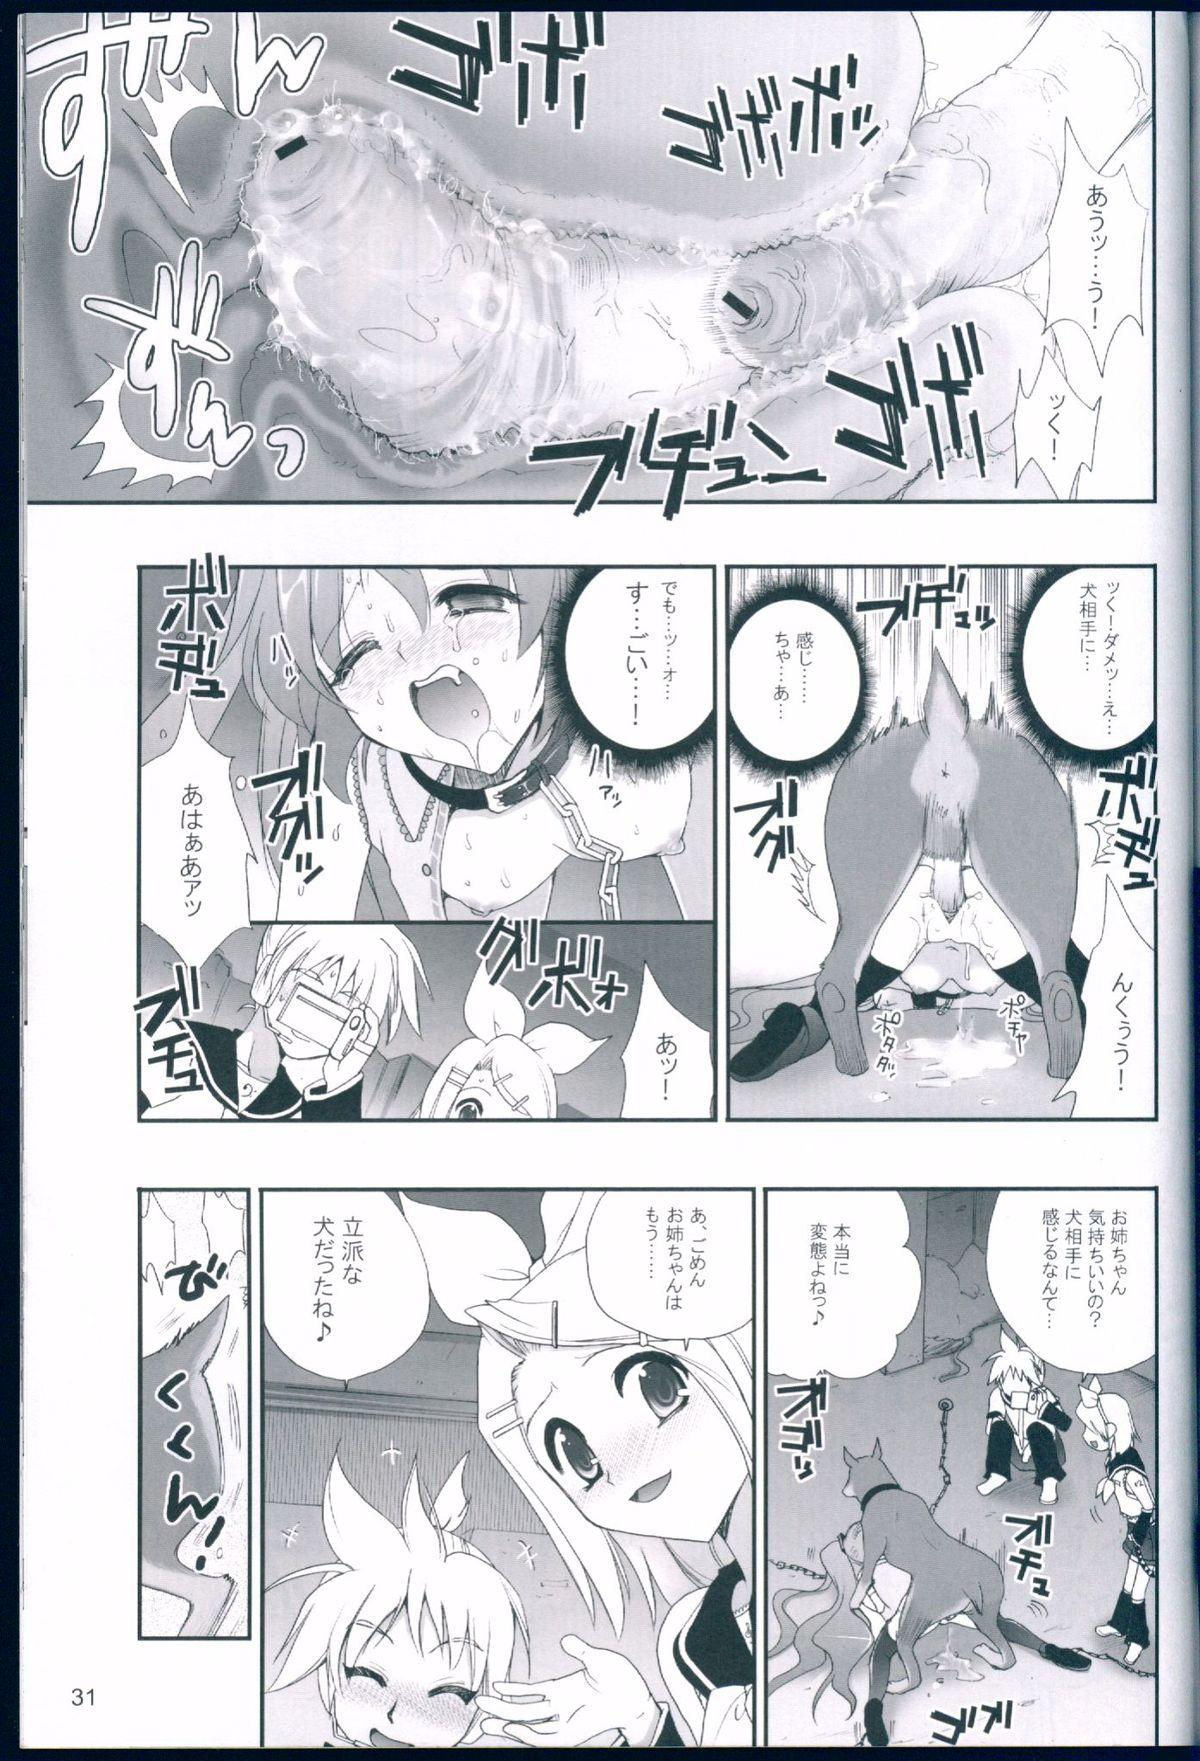 R Juu - Hatsune Miku Kenkan 30